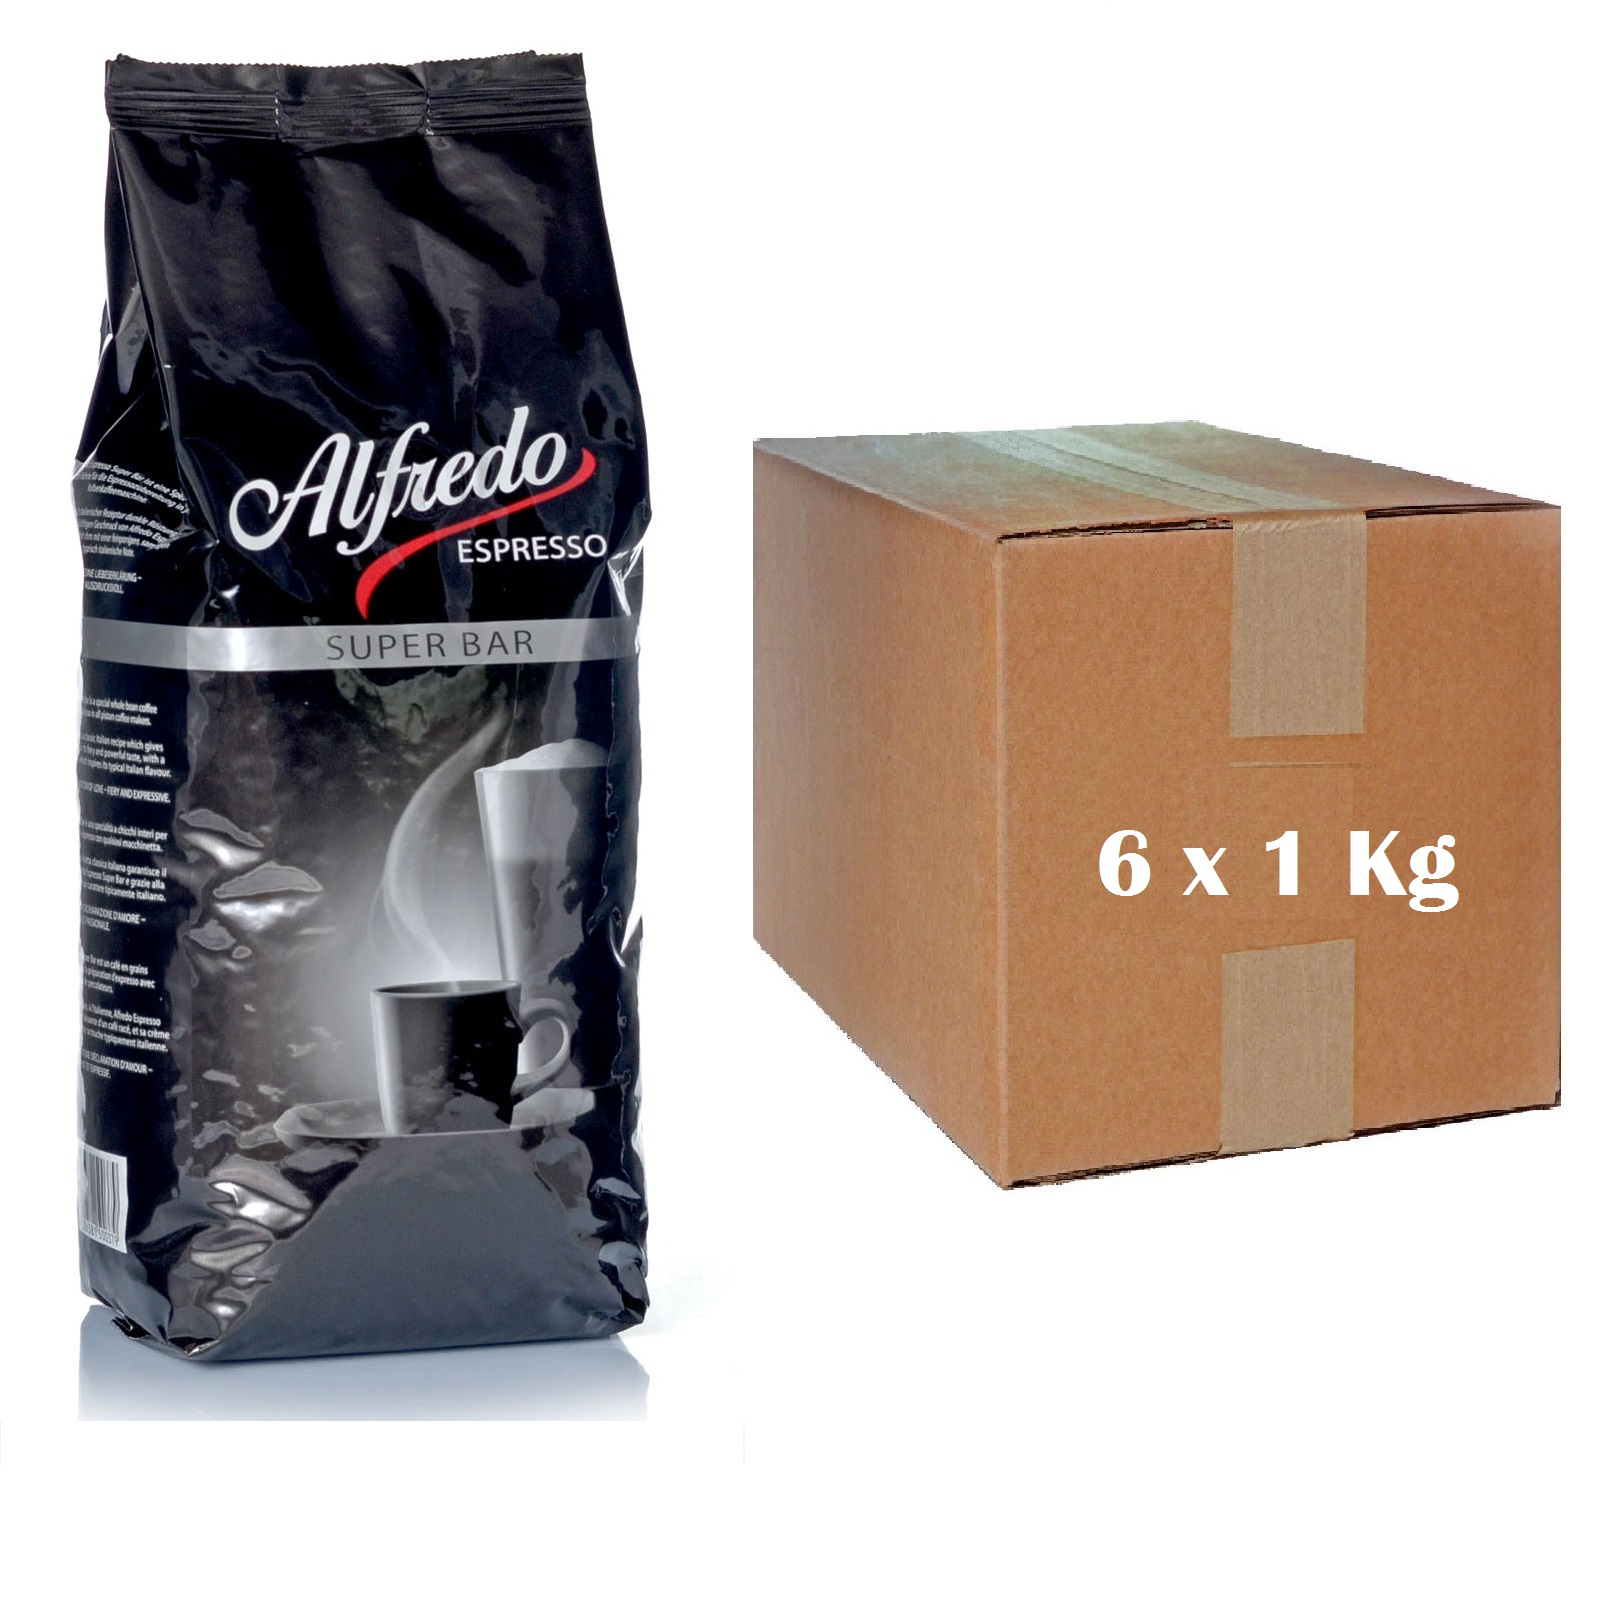 Alfredo Espresso Super Bar 6 x 1kg Espressobohnen